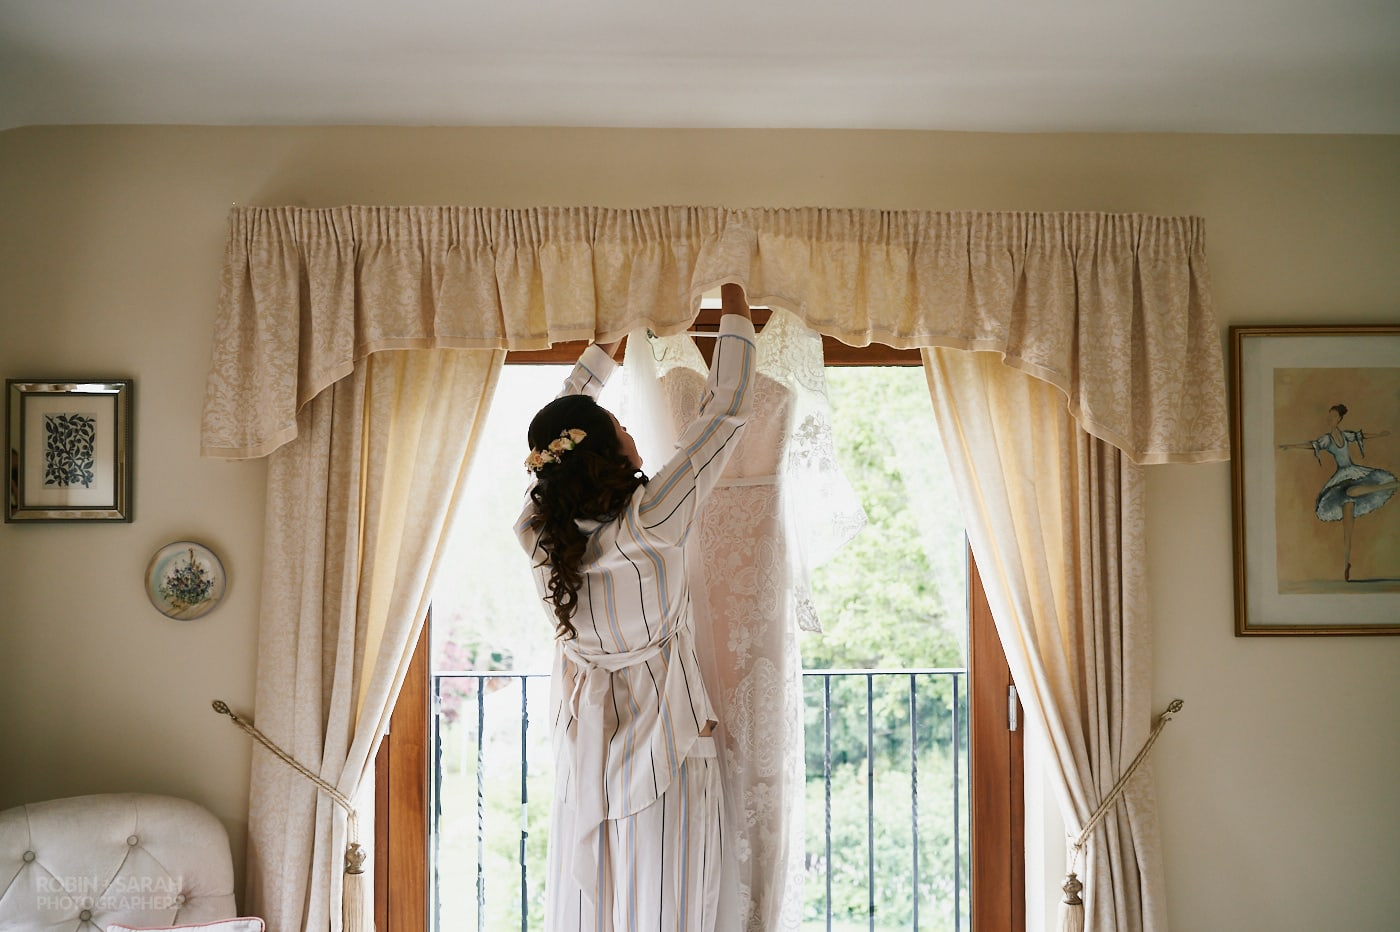 Bride hangs wedding dress on curtain rail